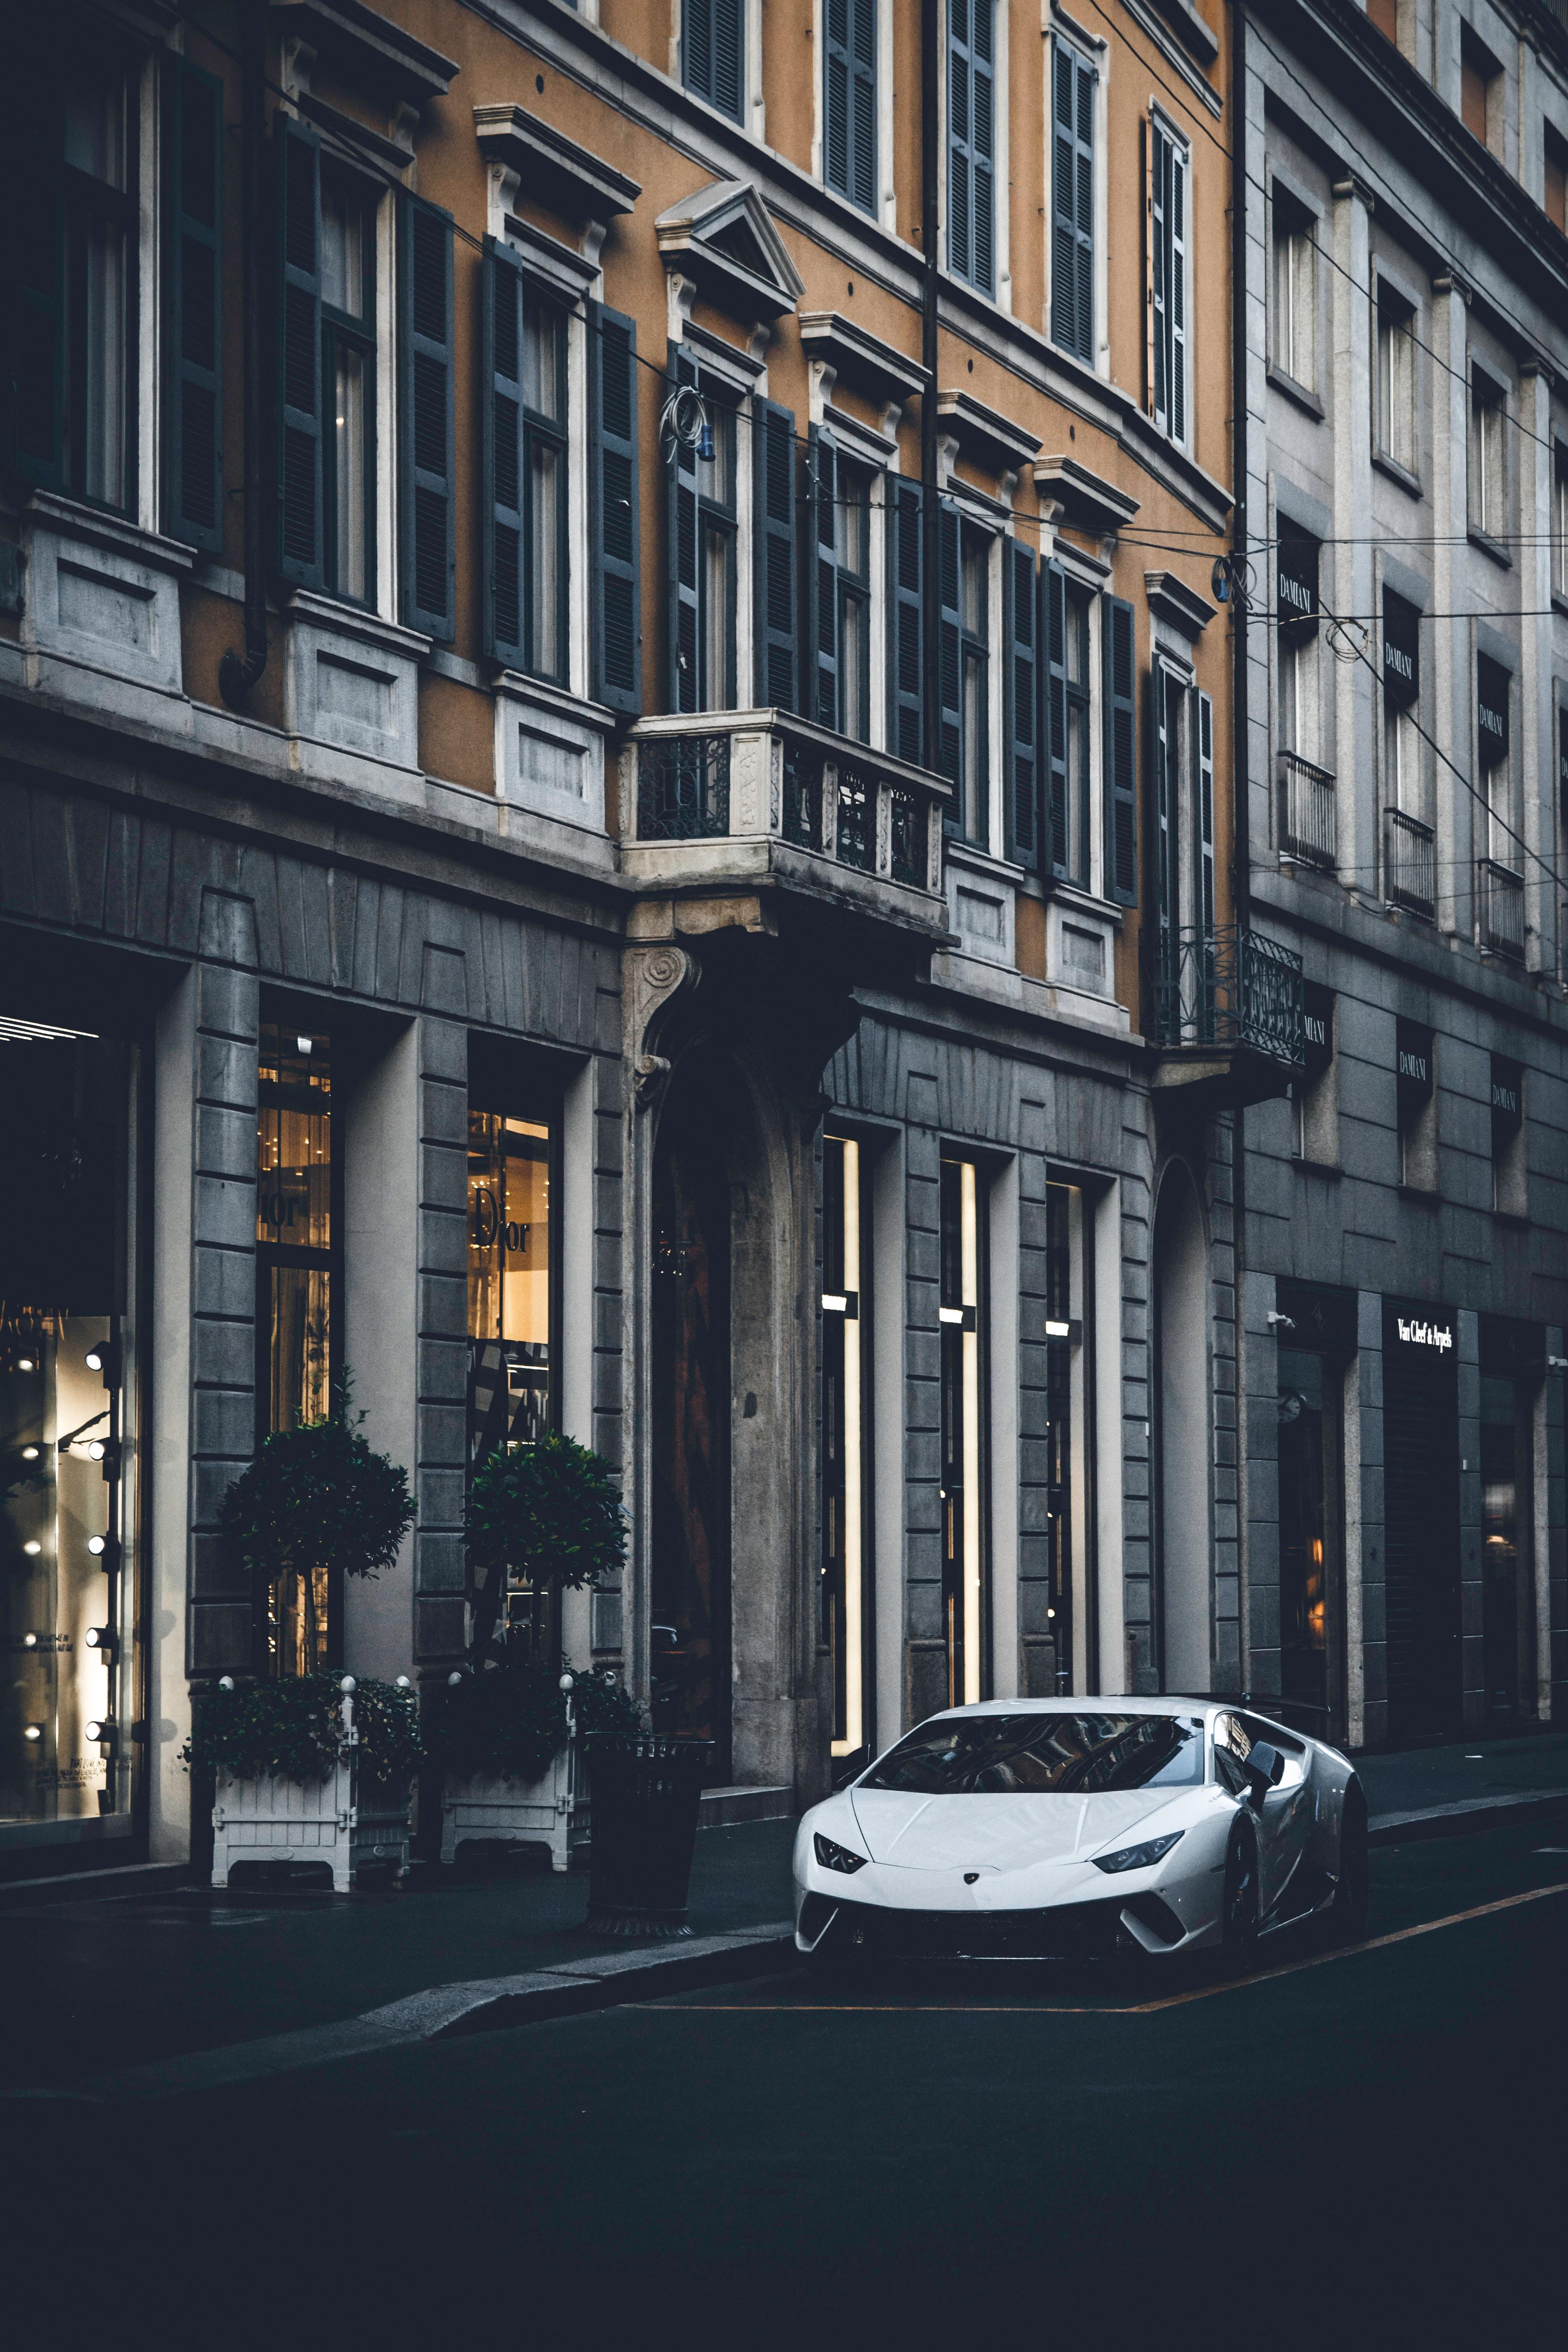 68541 Заставки и Обои Ламборджини (Lamborghini) на телефон. Скачать Ламборджини (Lamborghini), Тачки (Cars), Город, Дорога, Машина, Белый, Спорткар, Lamborghini Aventador картинки бесплатно